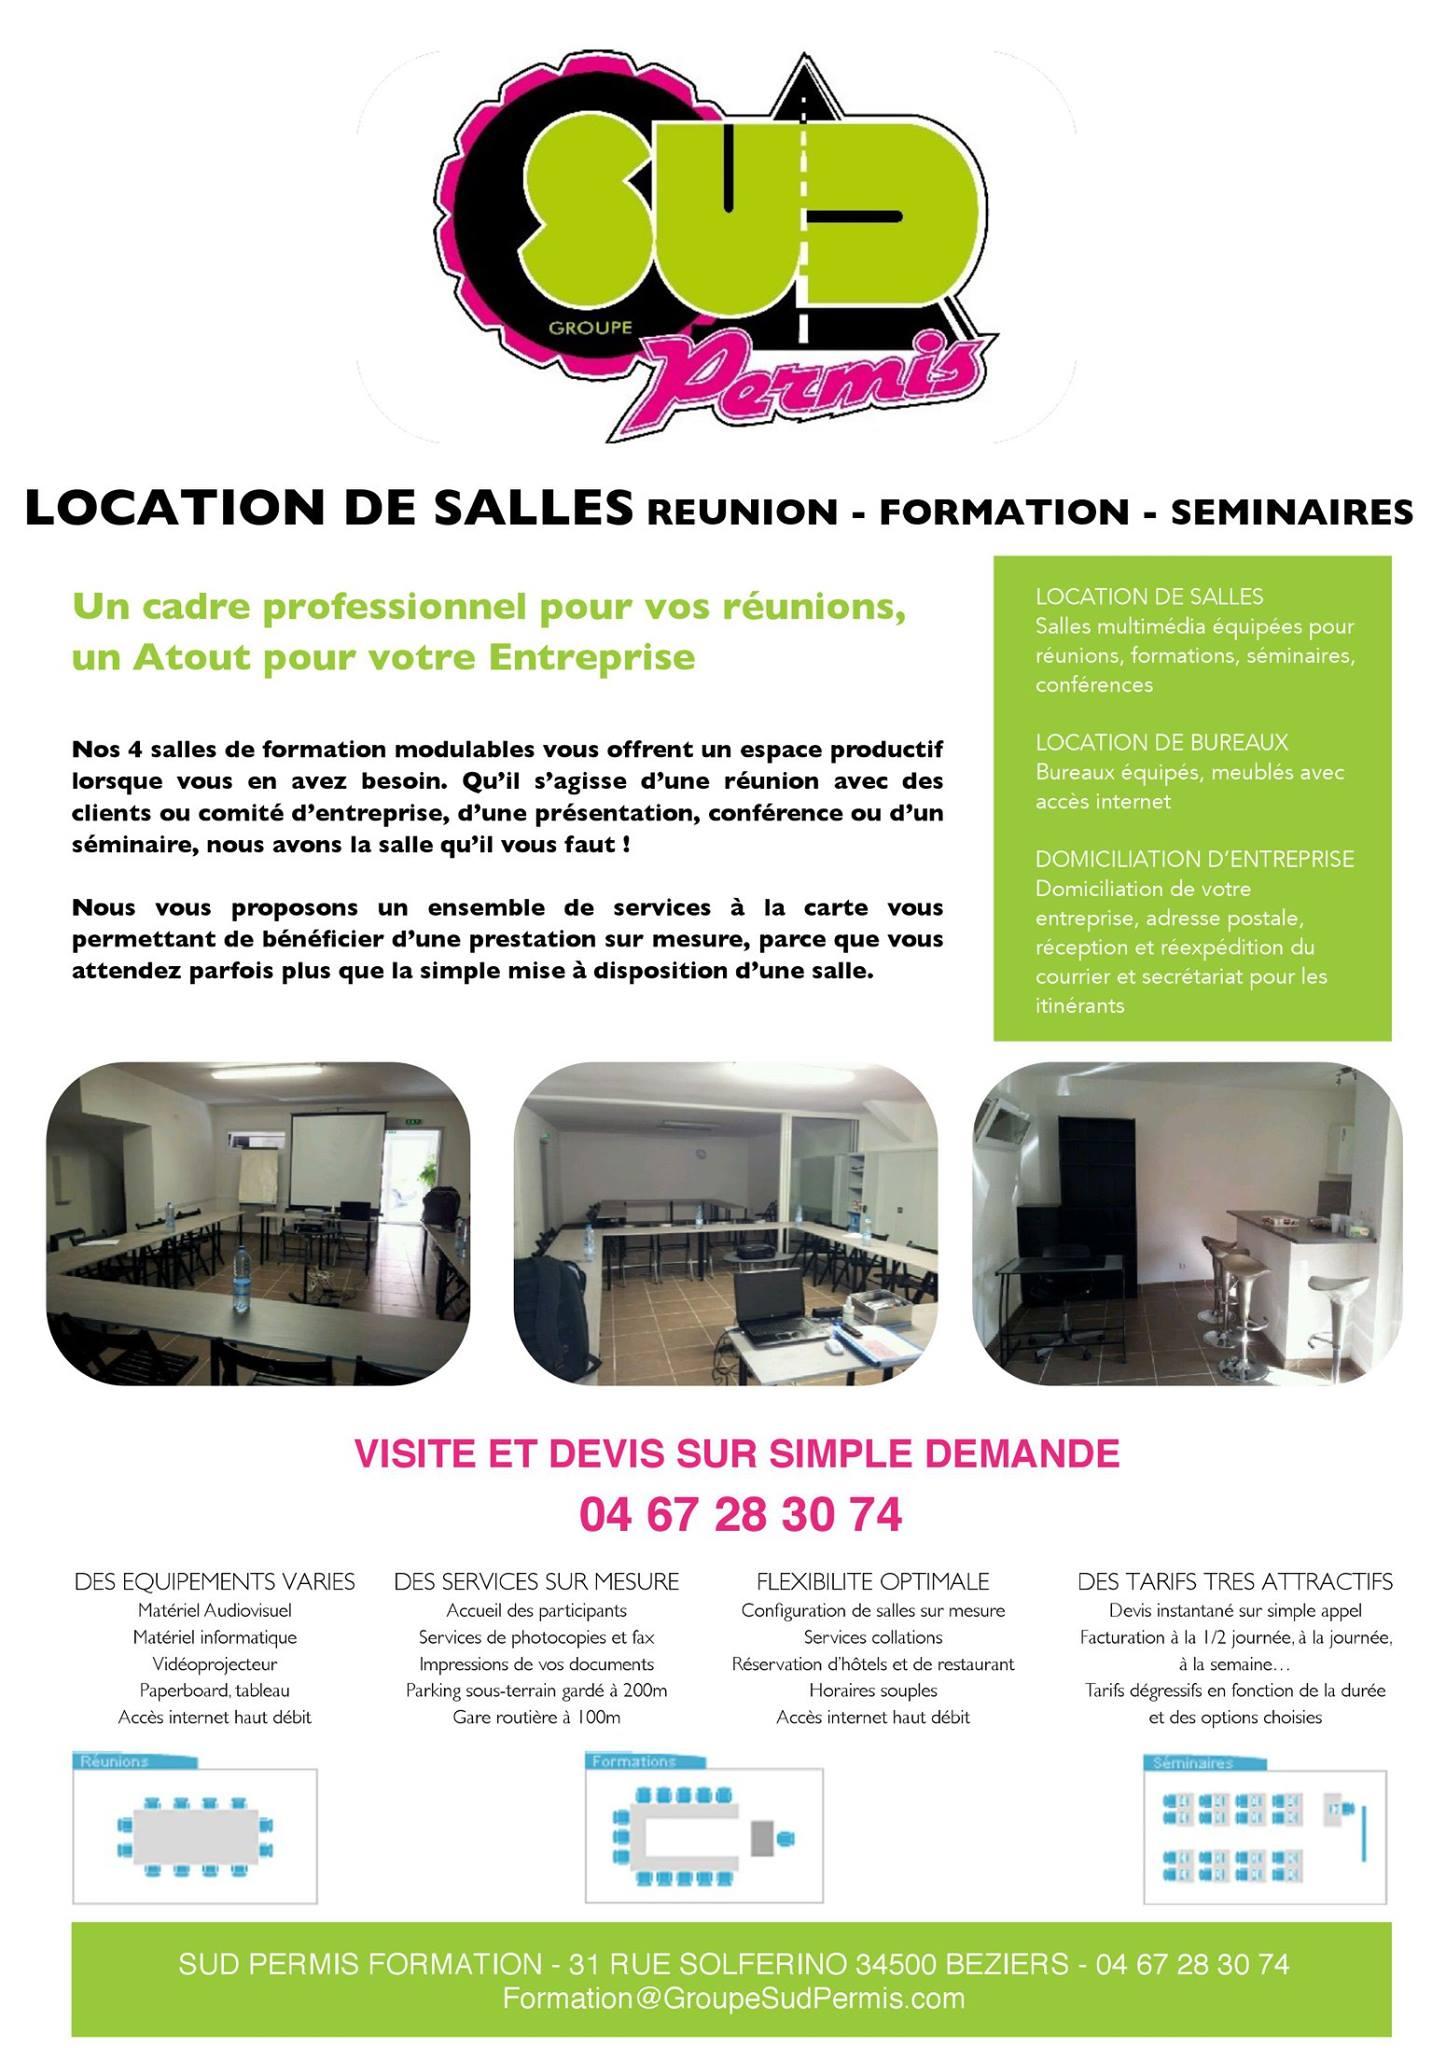 LOCATION DE SALLES 925972910775407_3085613836667383232_o